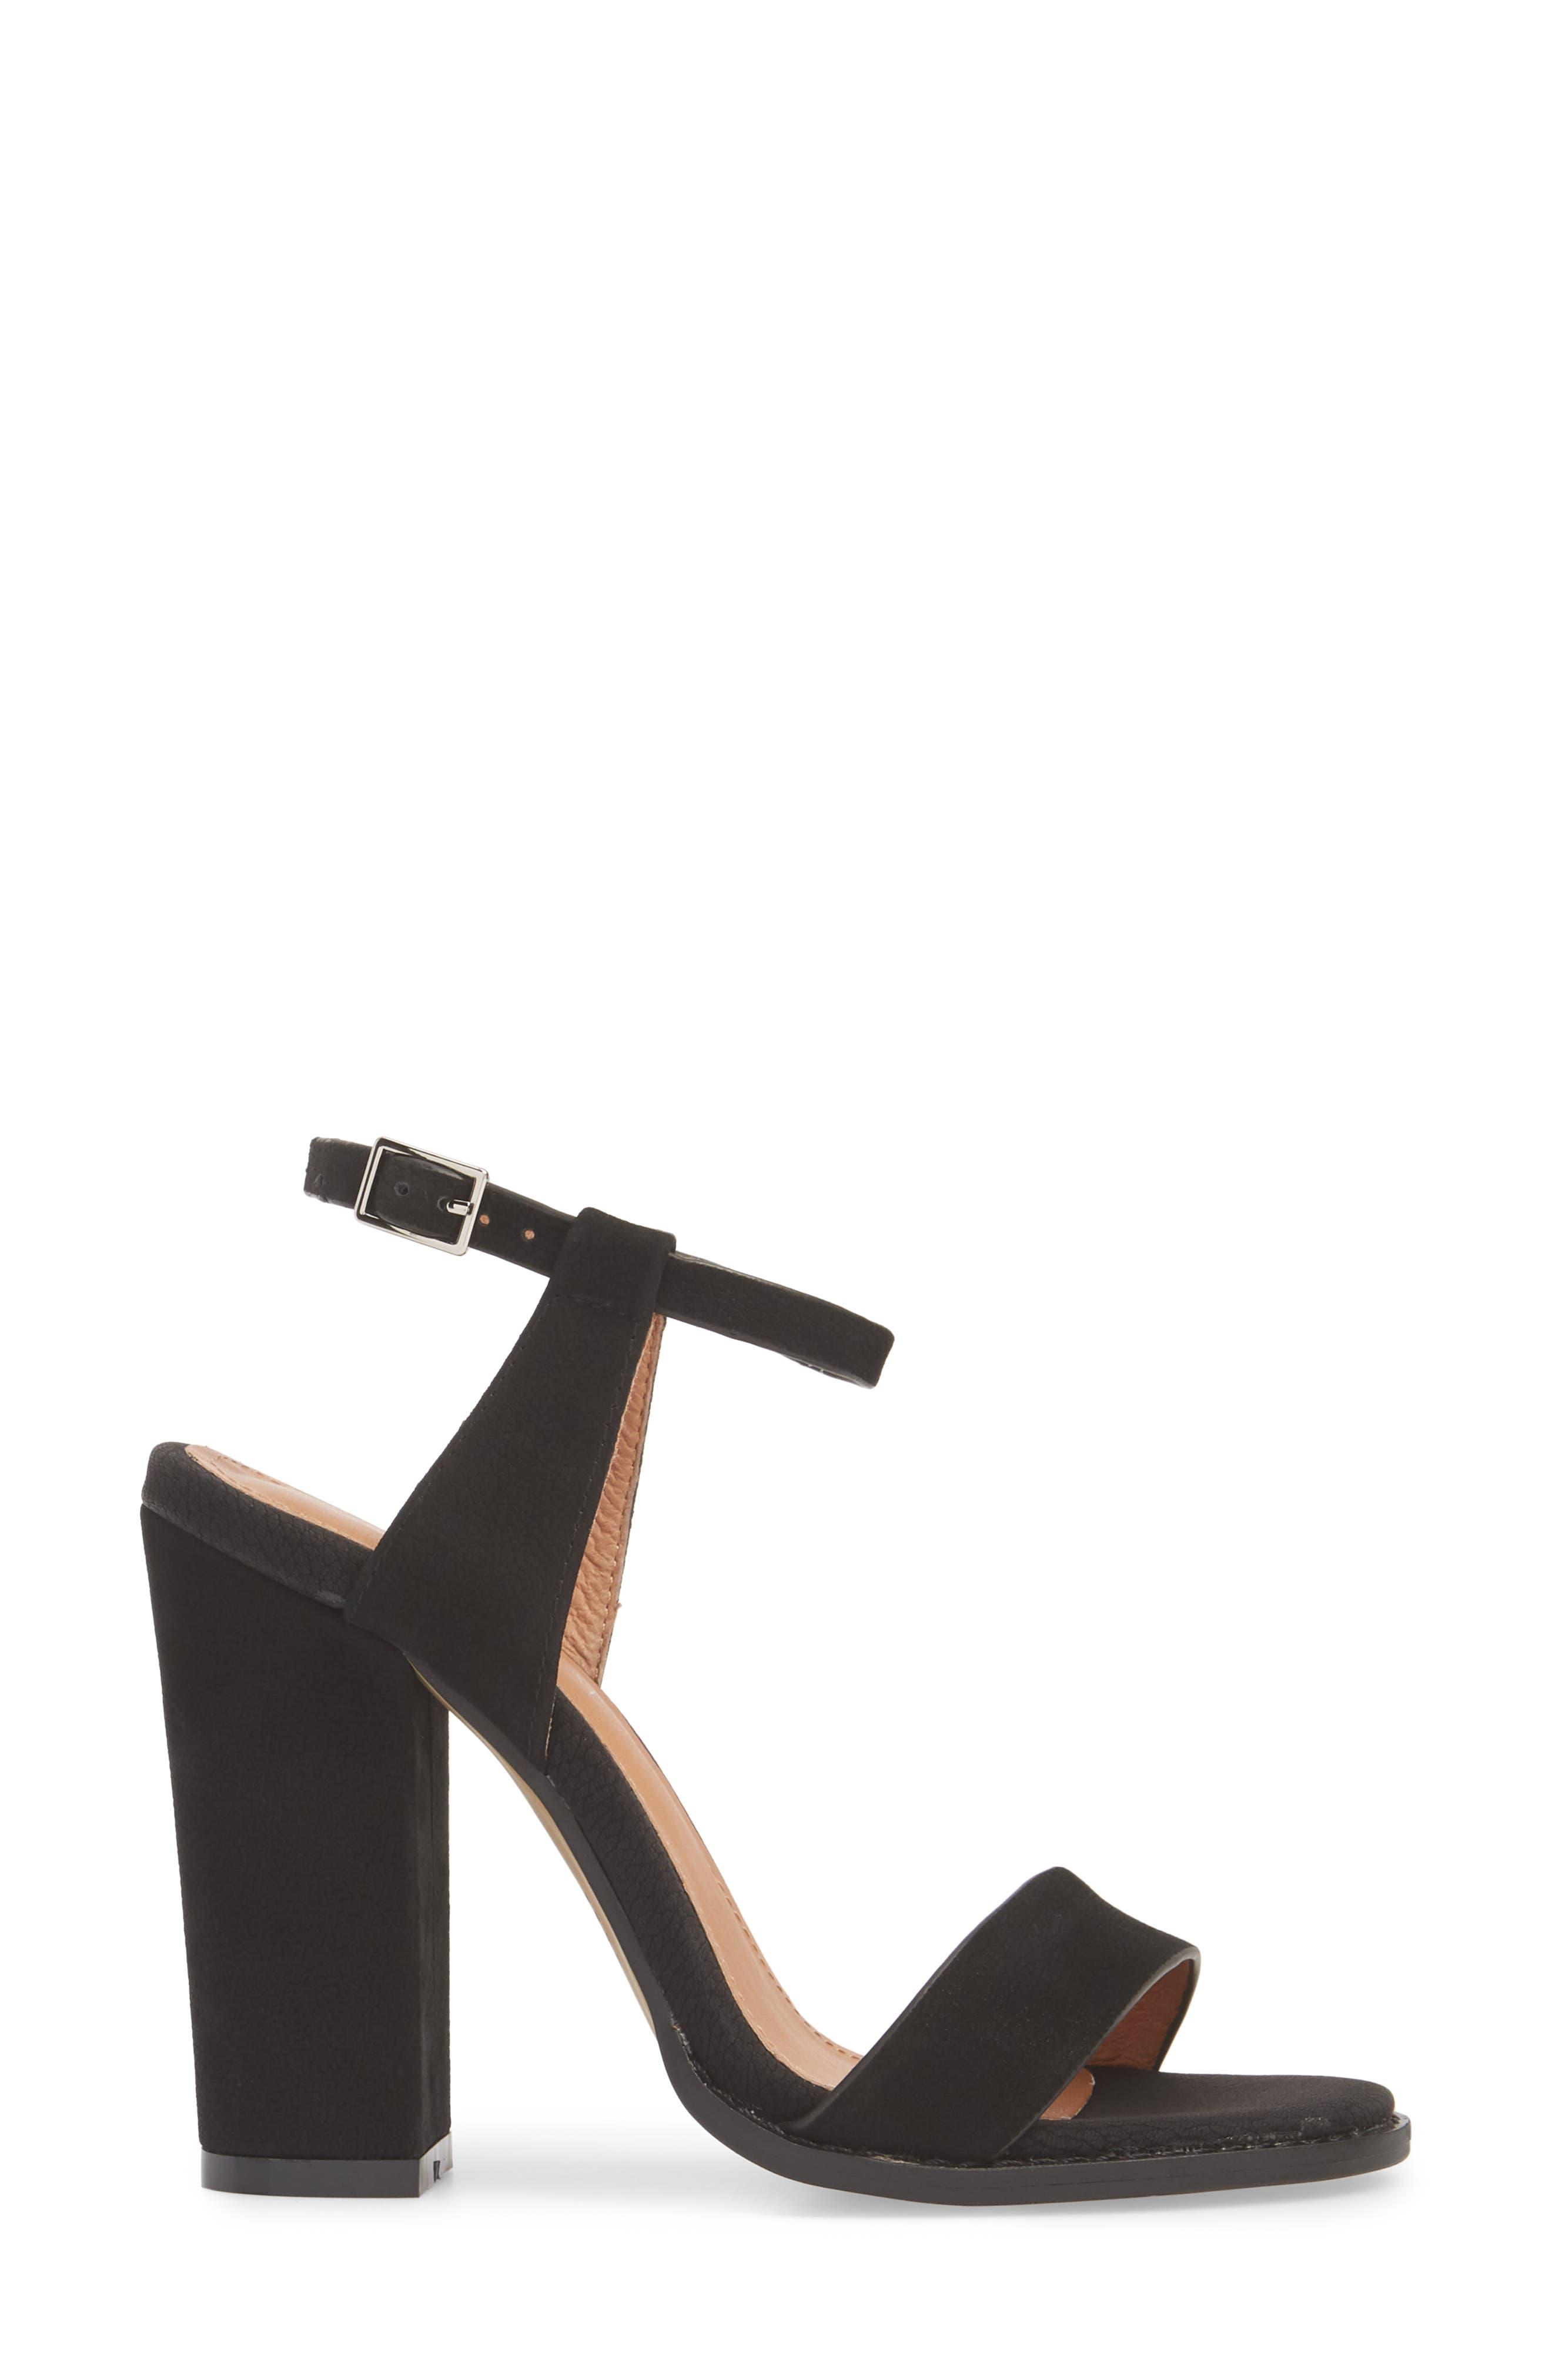 Jynk Sandal,                             Alternate thumbnail 3, color,                             Black Leather